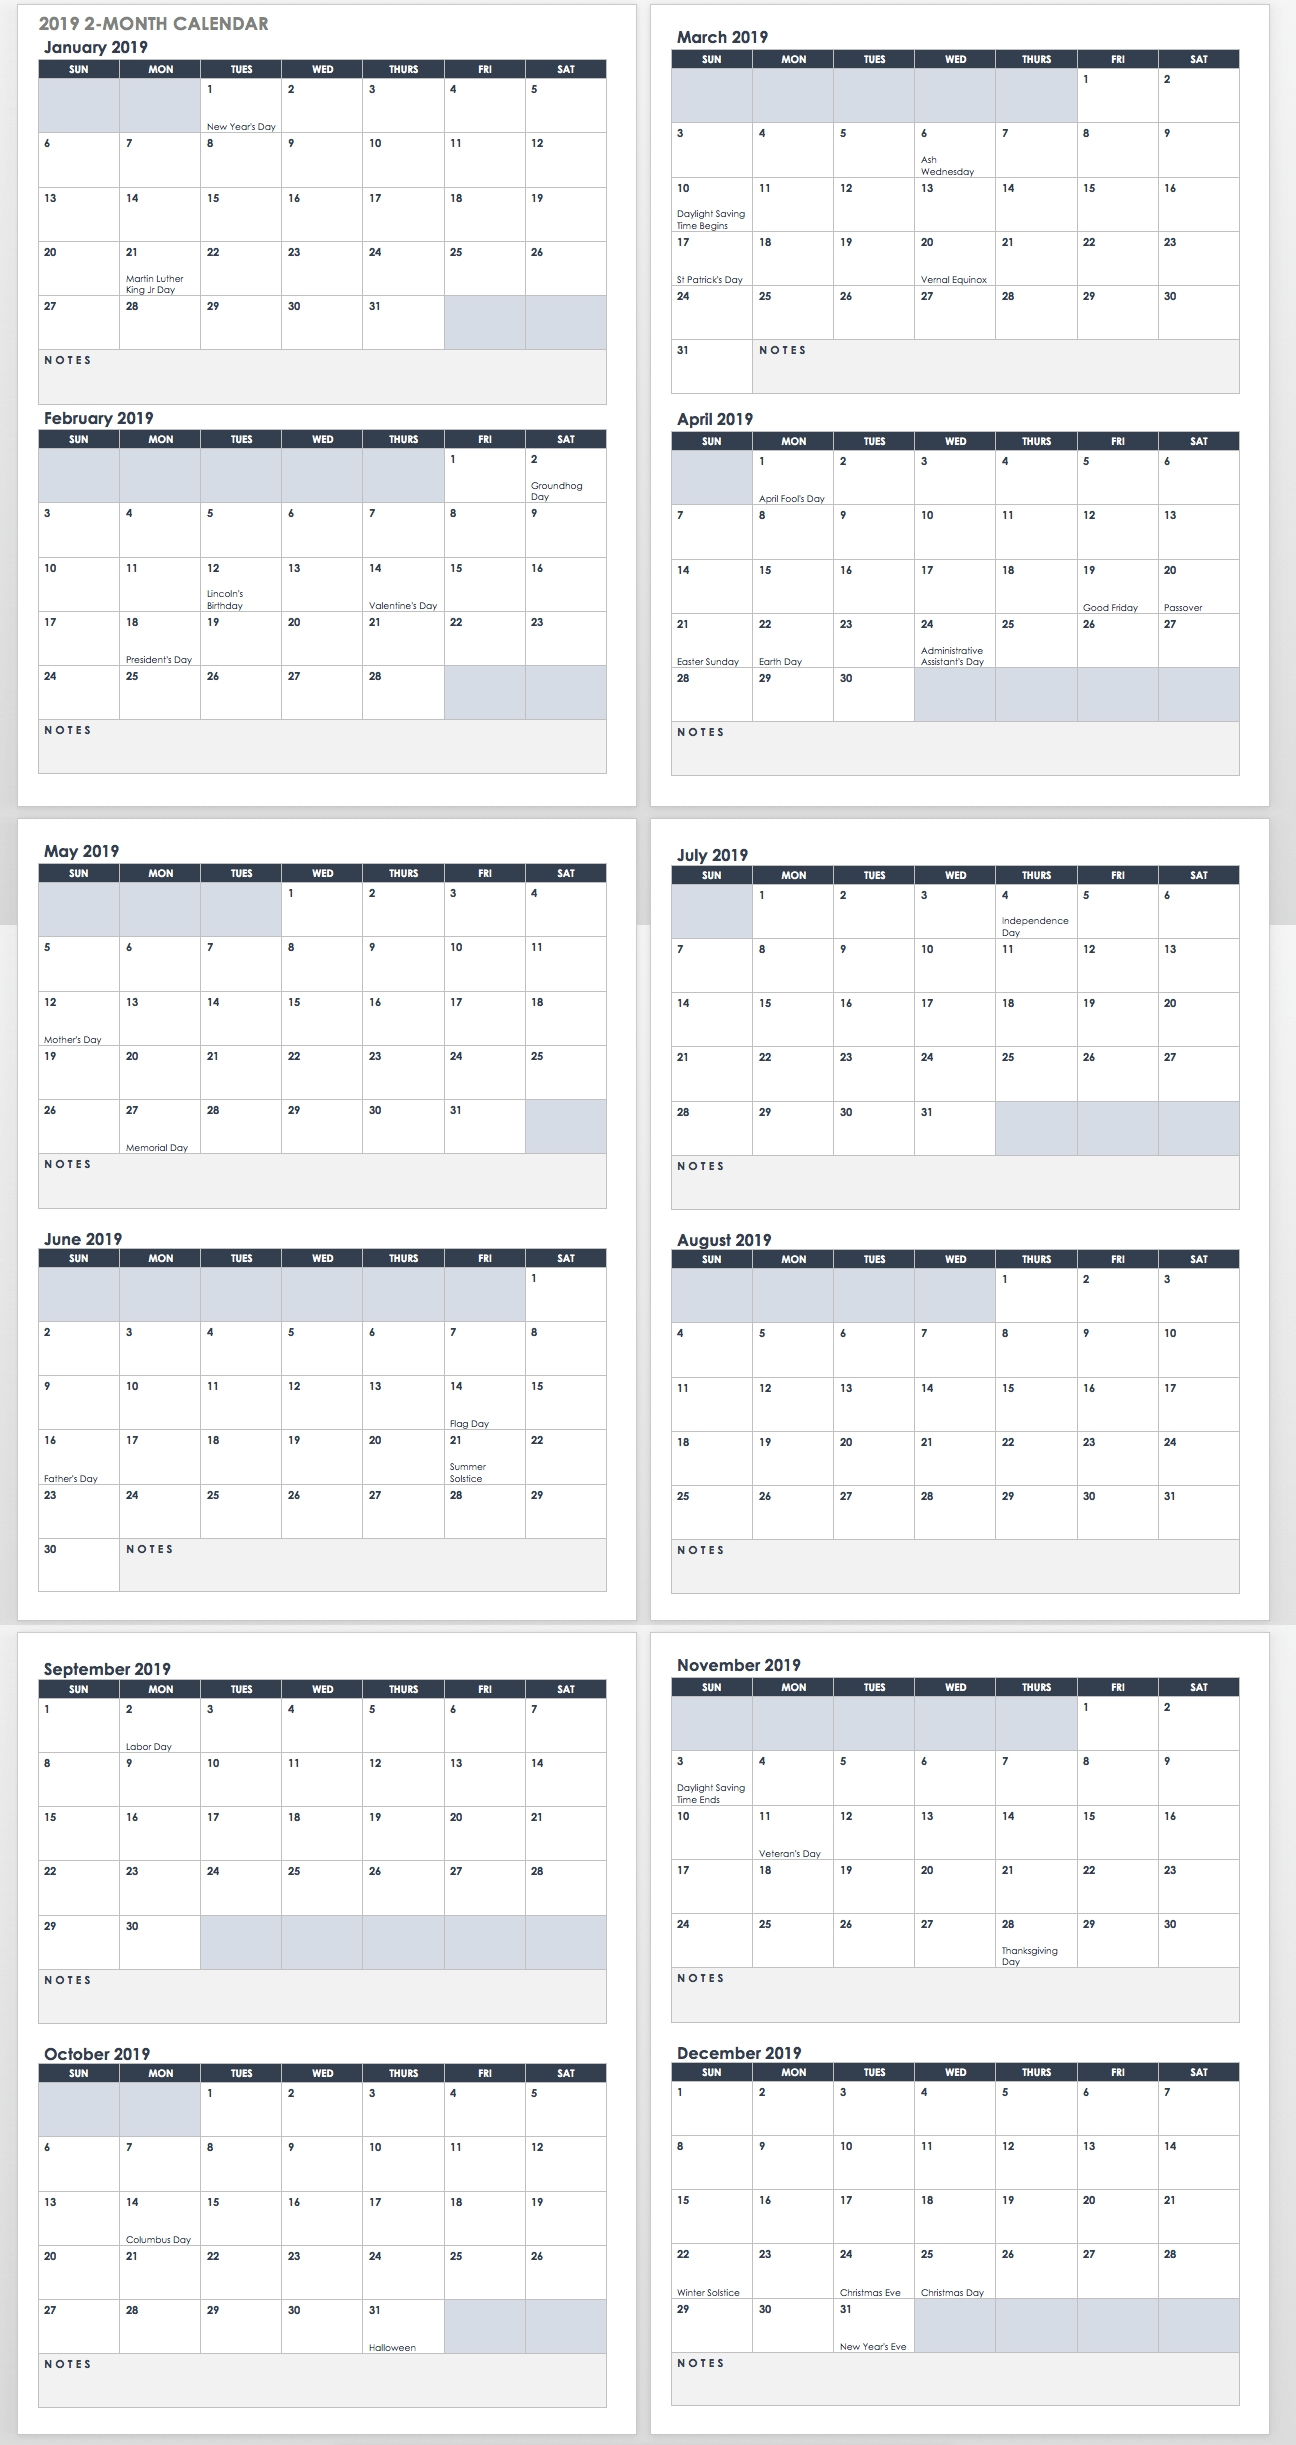 15 Free Monthly Calendar Templates | Smartsheet Calendar 2019 Outline